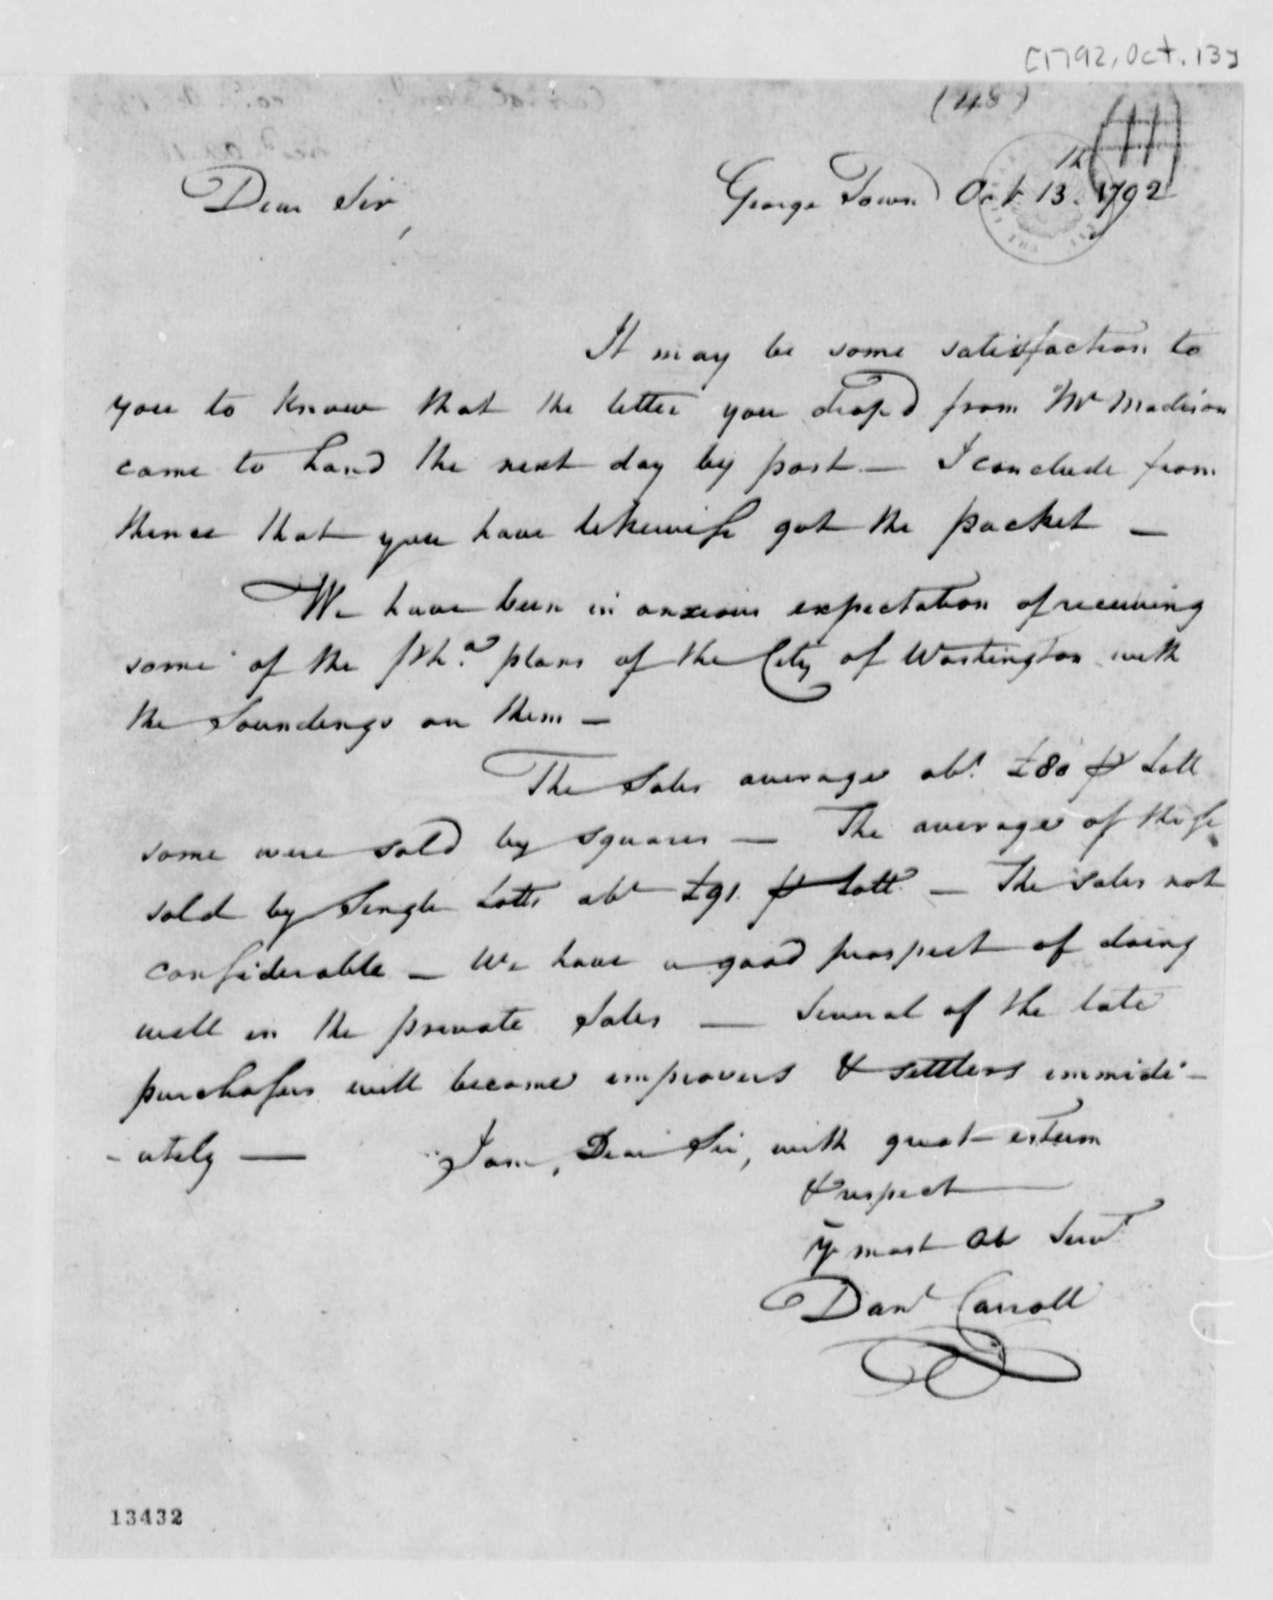 Daniel Carroll to Thomas Jefferson, October 13, 1792